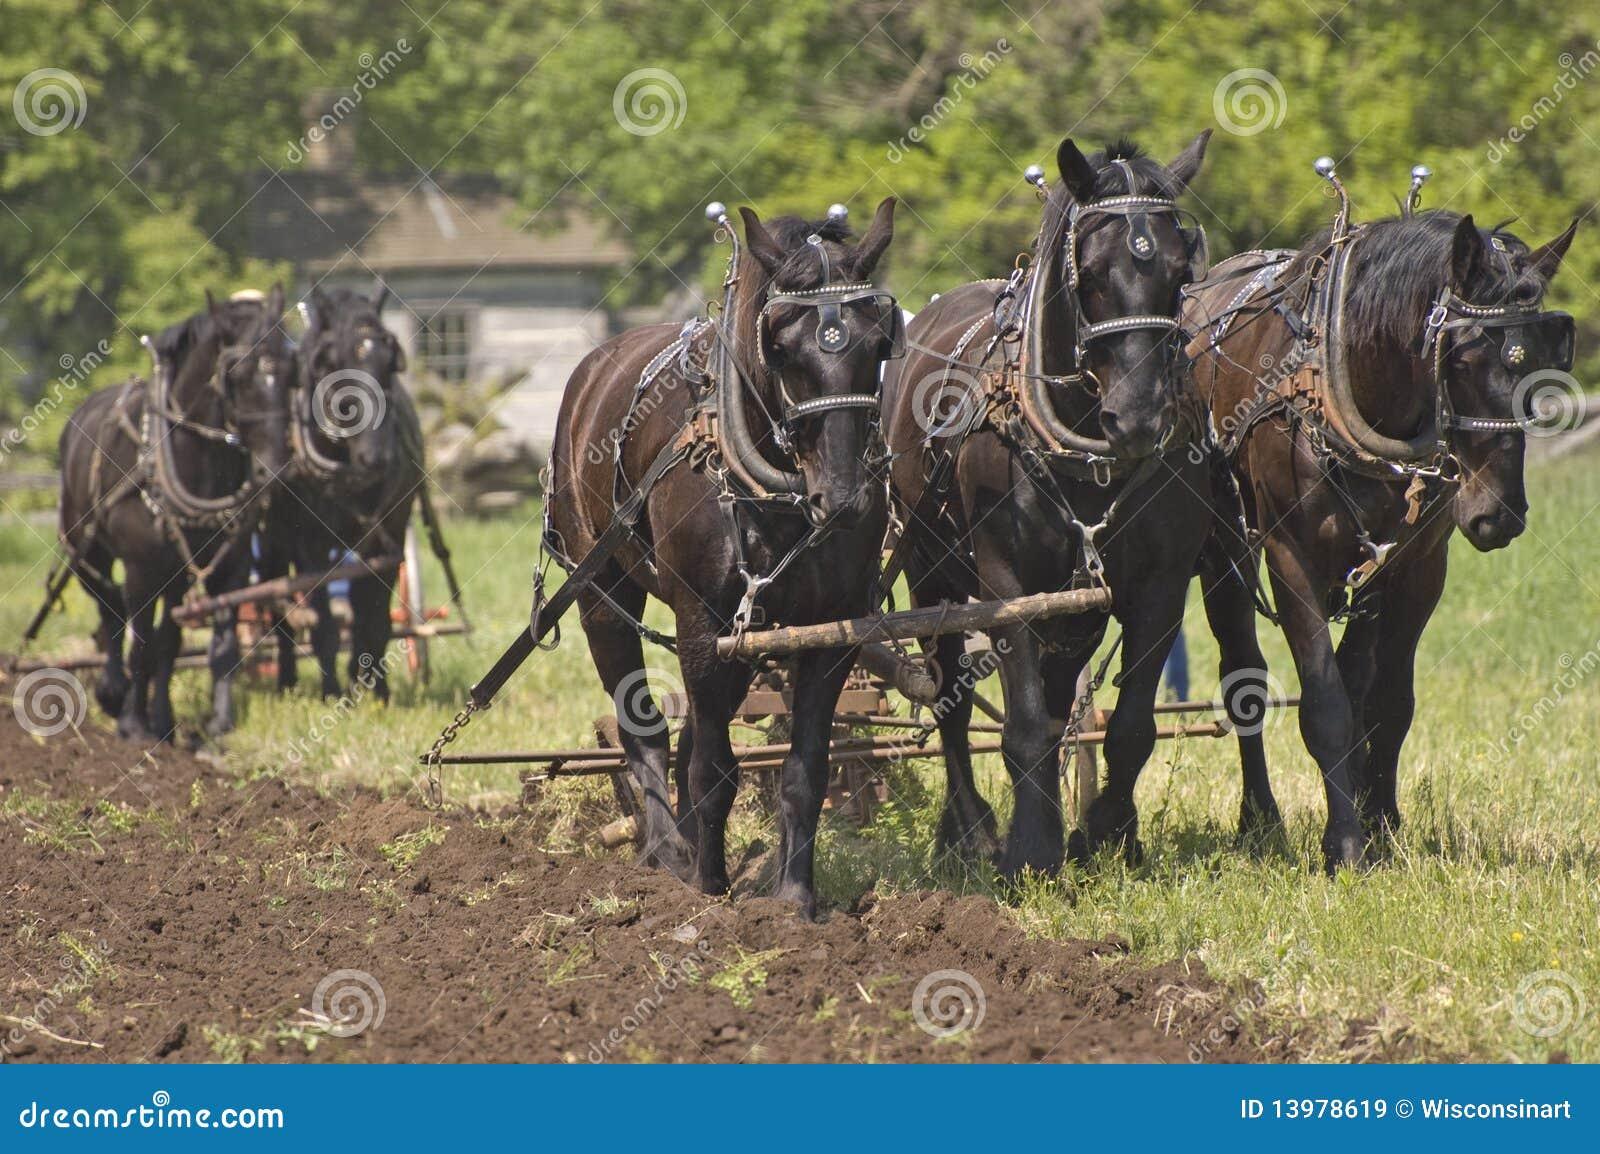 Plow Horses Team Plowing Farm Cornfield Royalty Free Stock